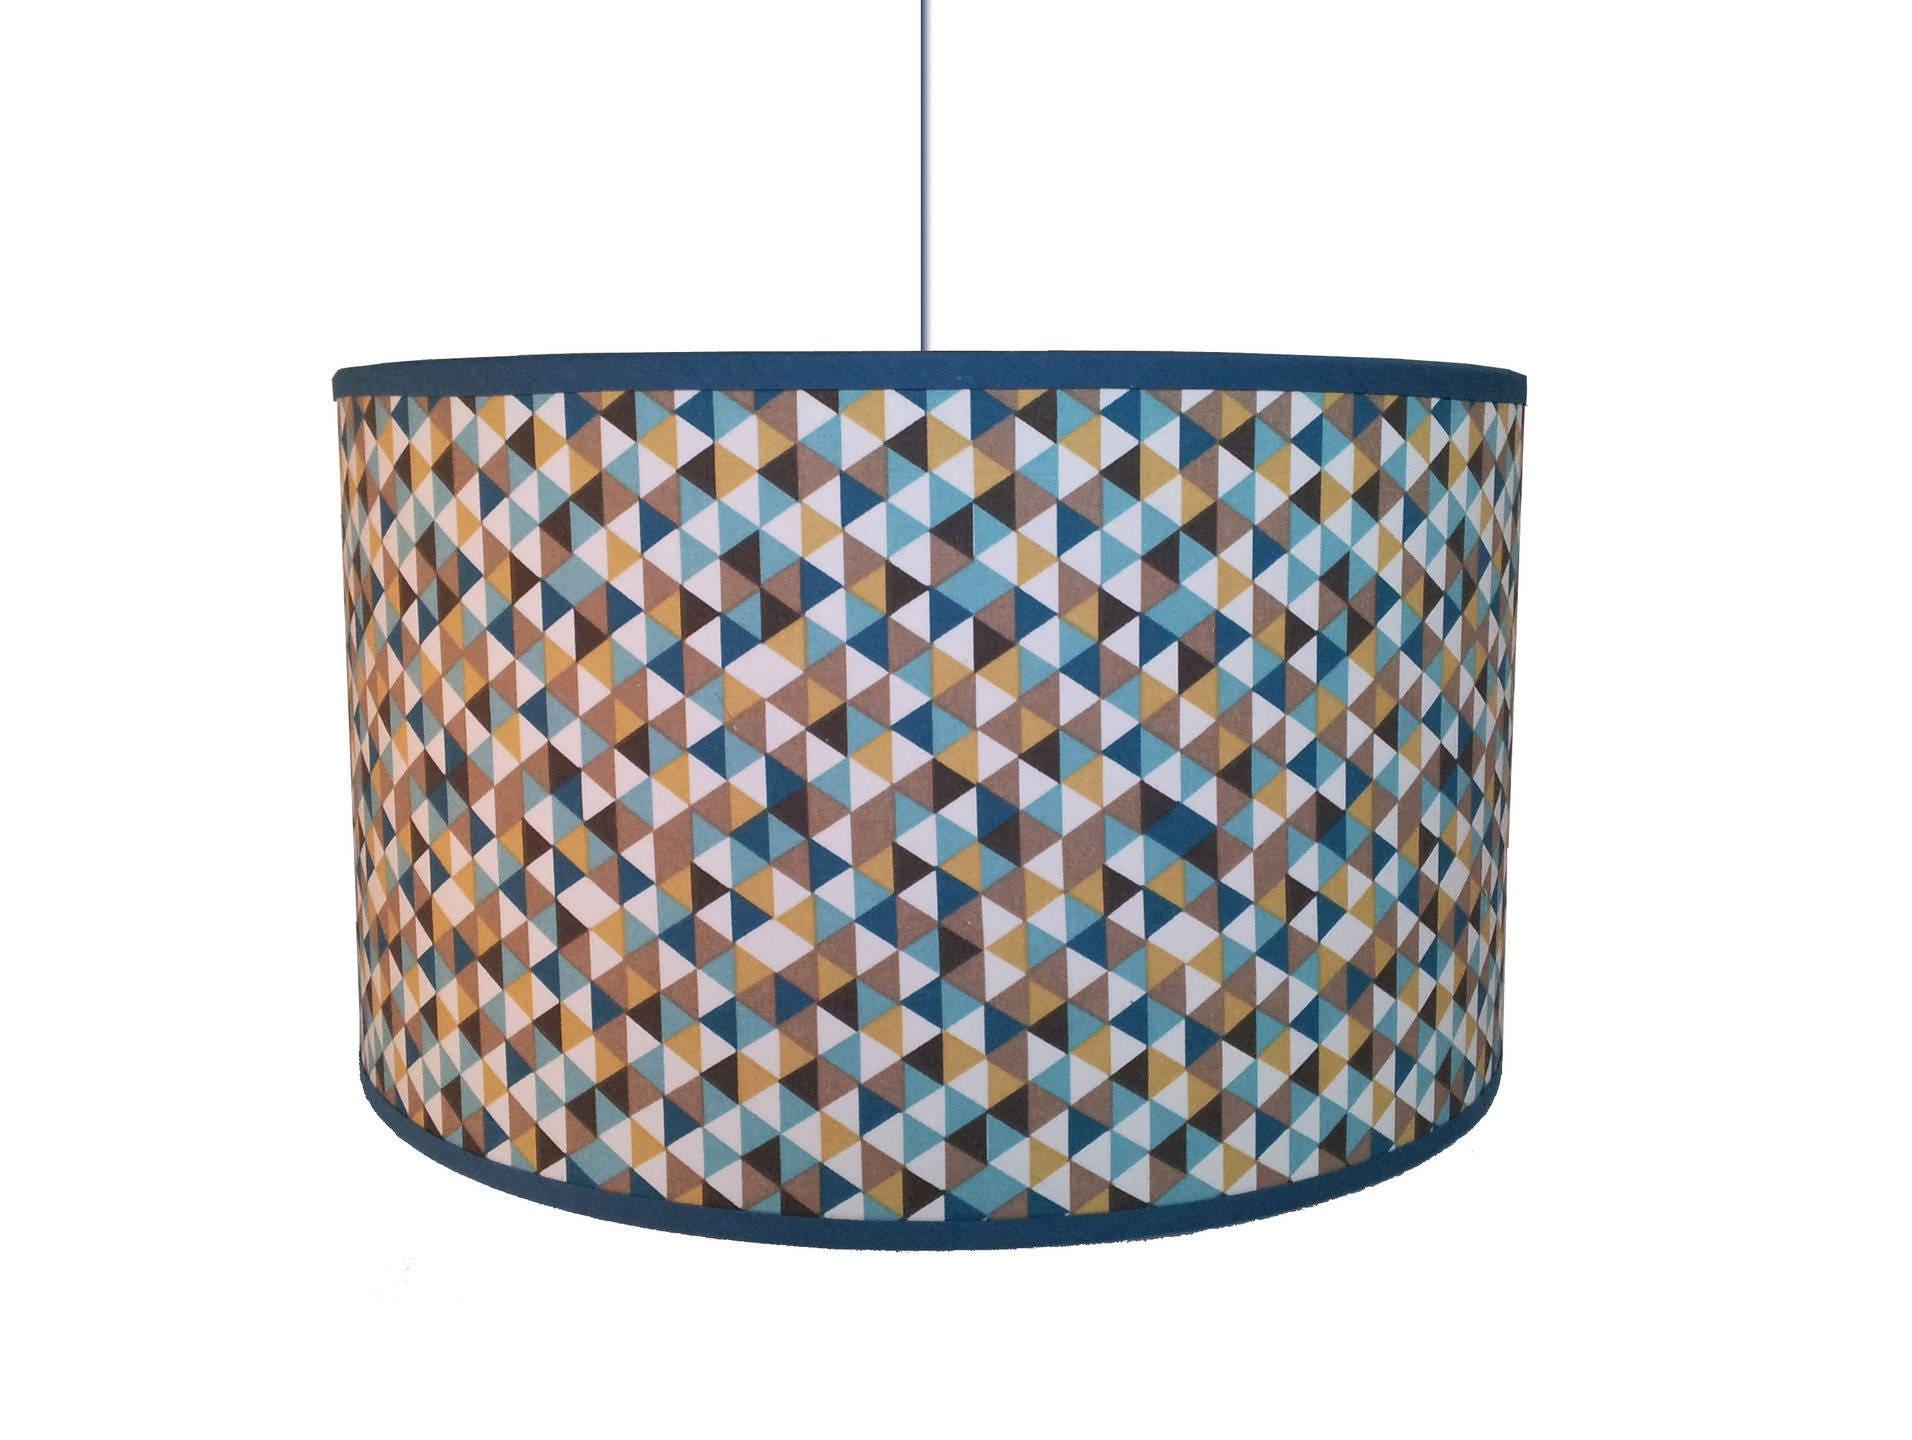 tres grand abat jour motif triangles bleus moutarde et canard. Black Bedroom Furniture Sets. Home Design Ideas